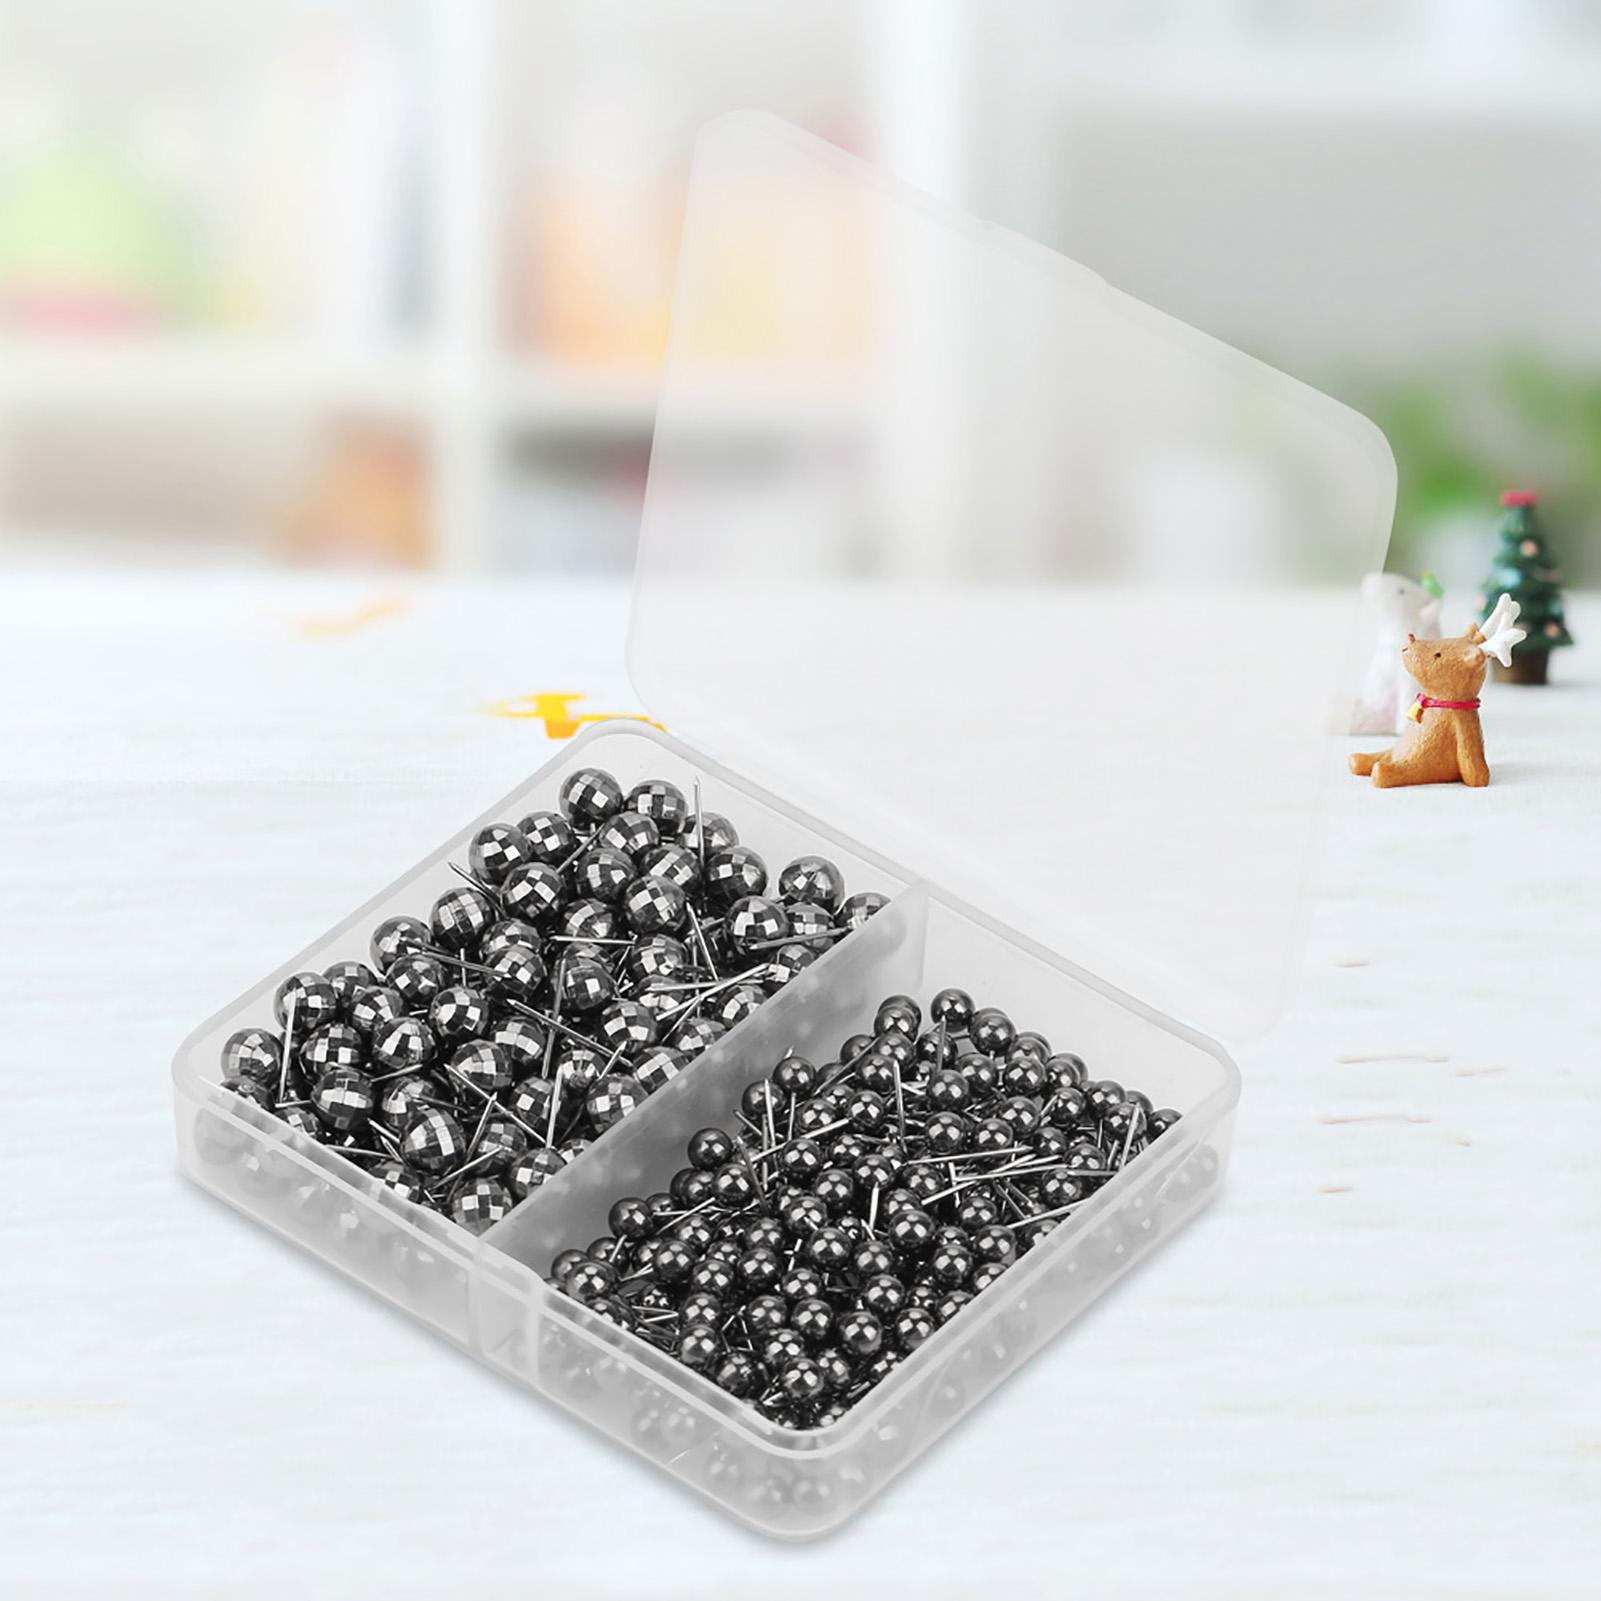 300x-multicolore-couture-a-coudre-tete-ronde-perle-Straight-PINS-outil-pratique miniature 20